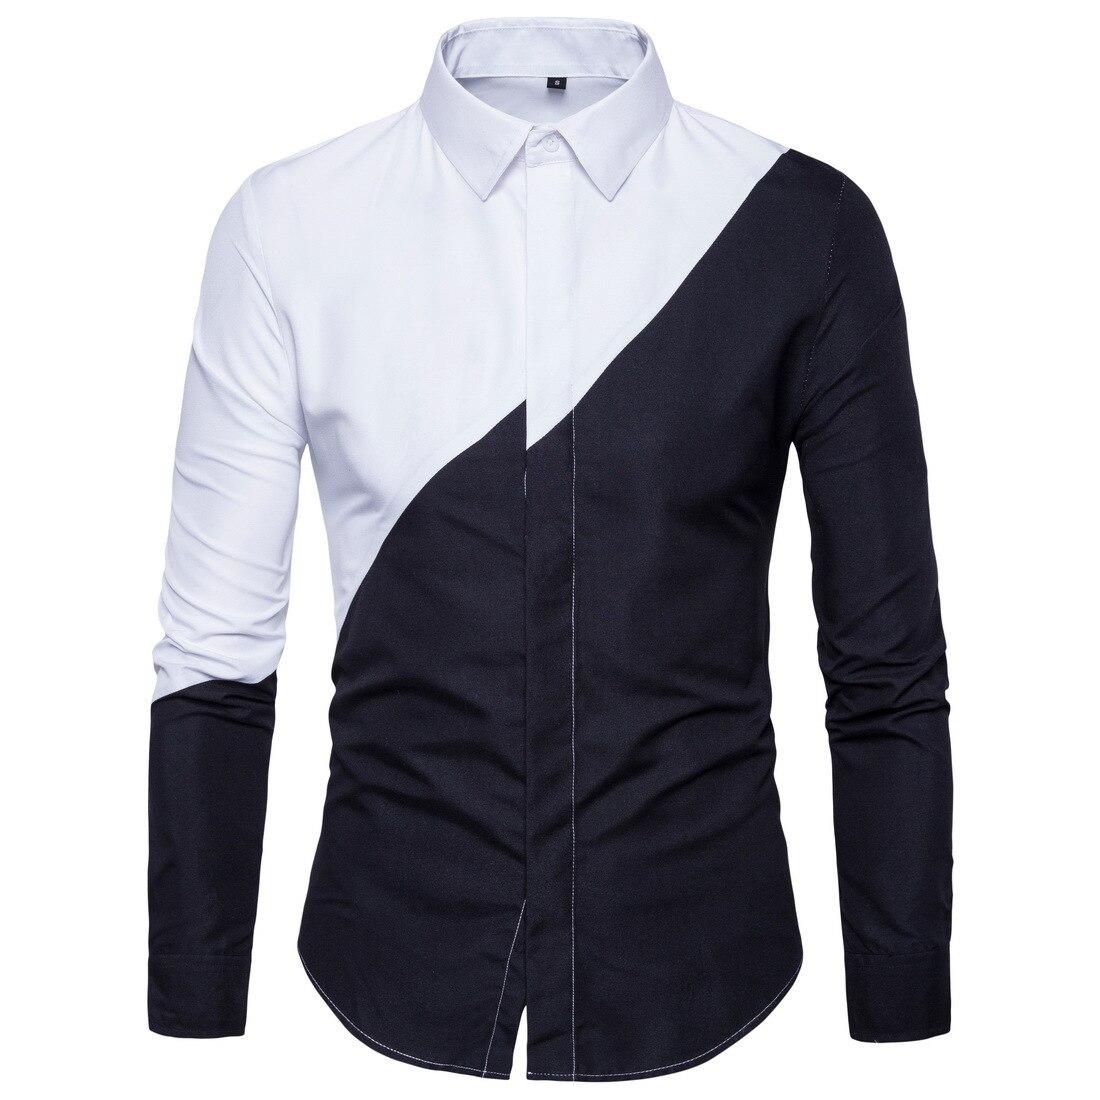 Shirt Men 2018 New Black White Patchwork Mens Long-sleeved Shirts Men Dress Clothes 2018 Chemise Homme Man Shirts High Quality